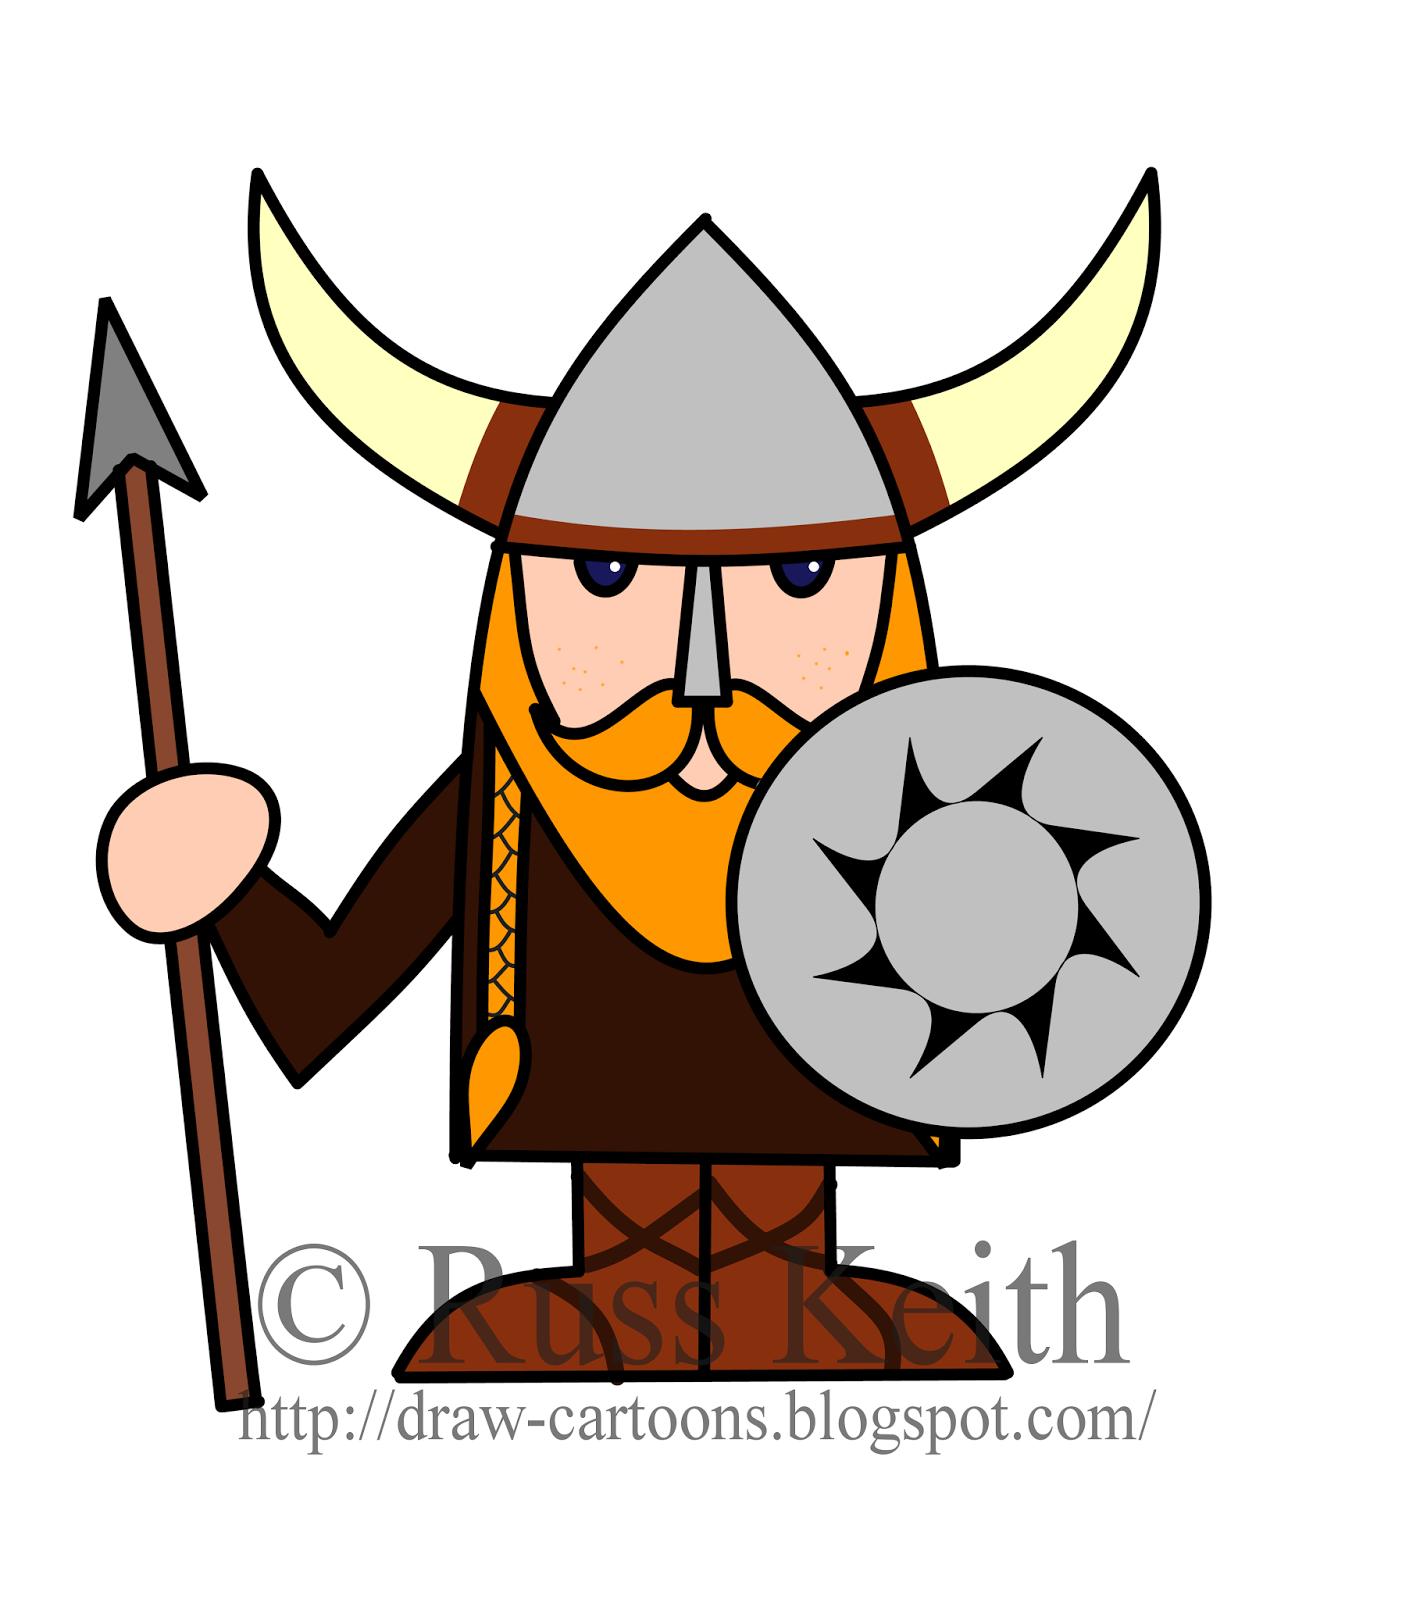 Drawn viking comic Viking Bay Draw Cartoons Drawings